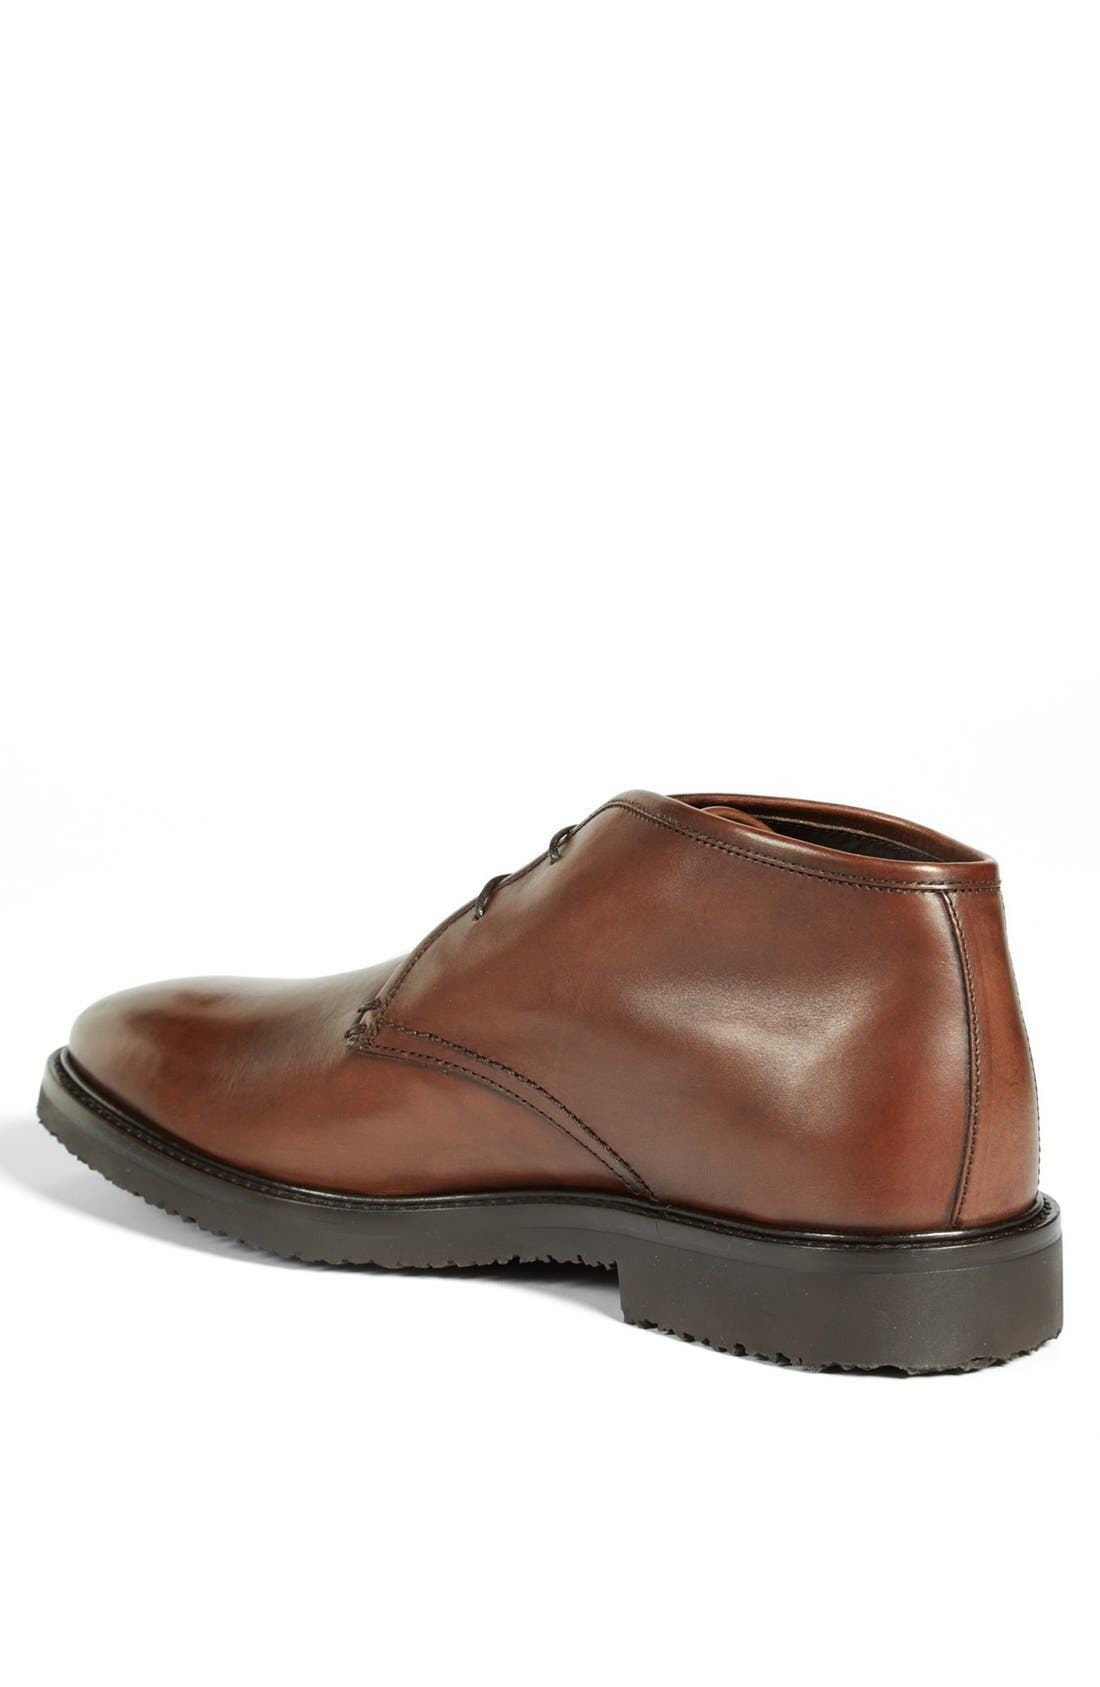 Alternate Image 2  - Ermenegildo Zegna Leather Chukka Boot